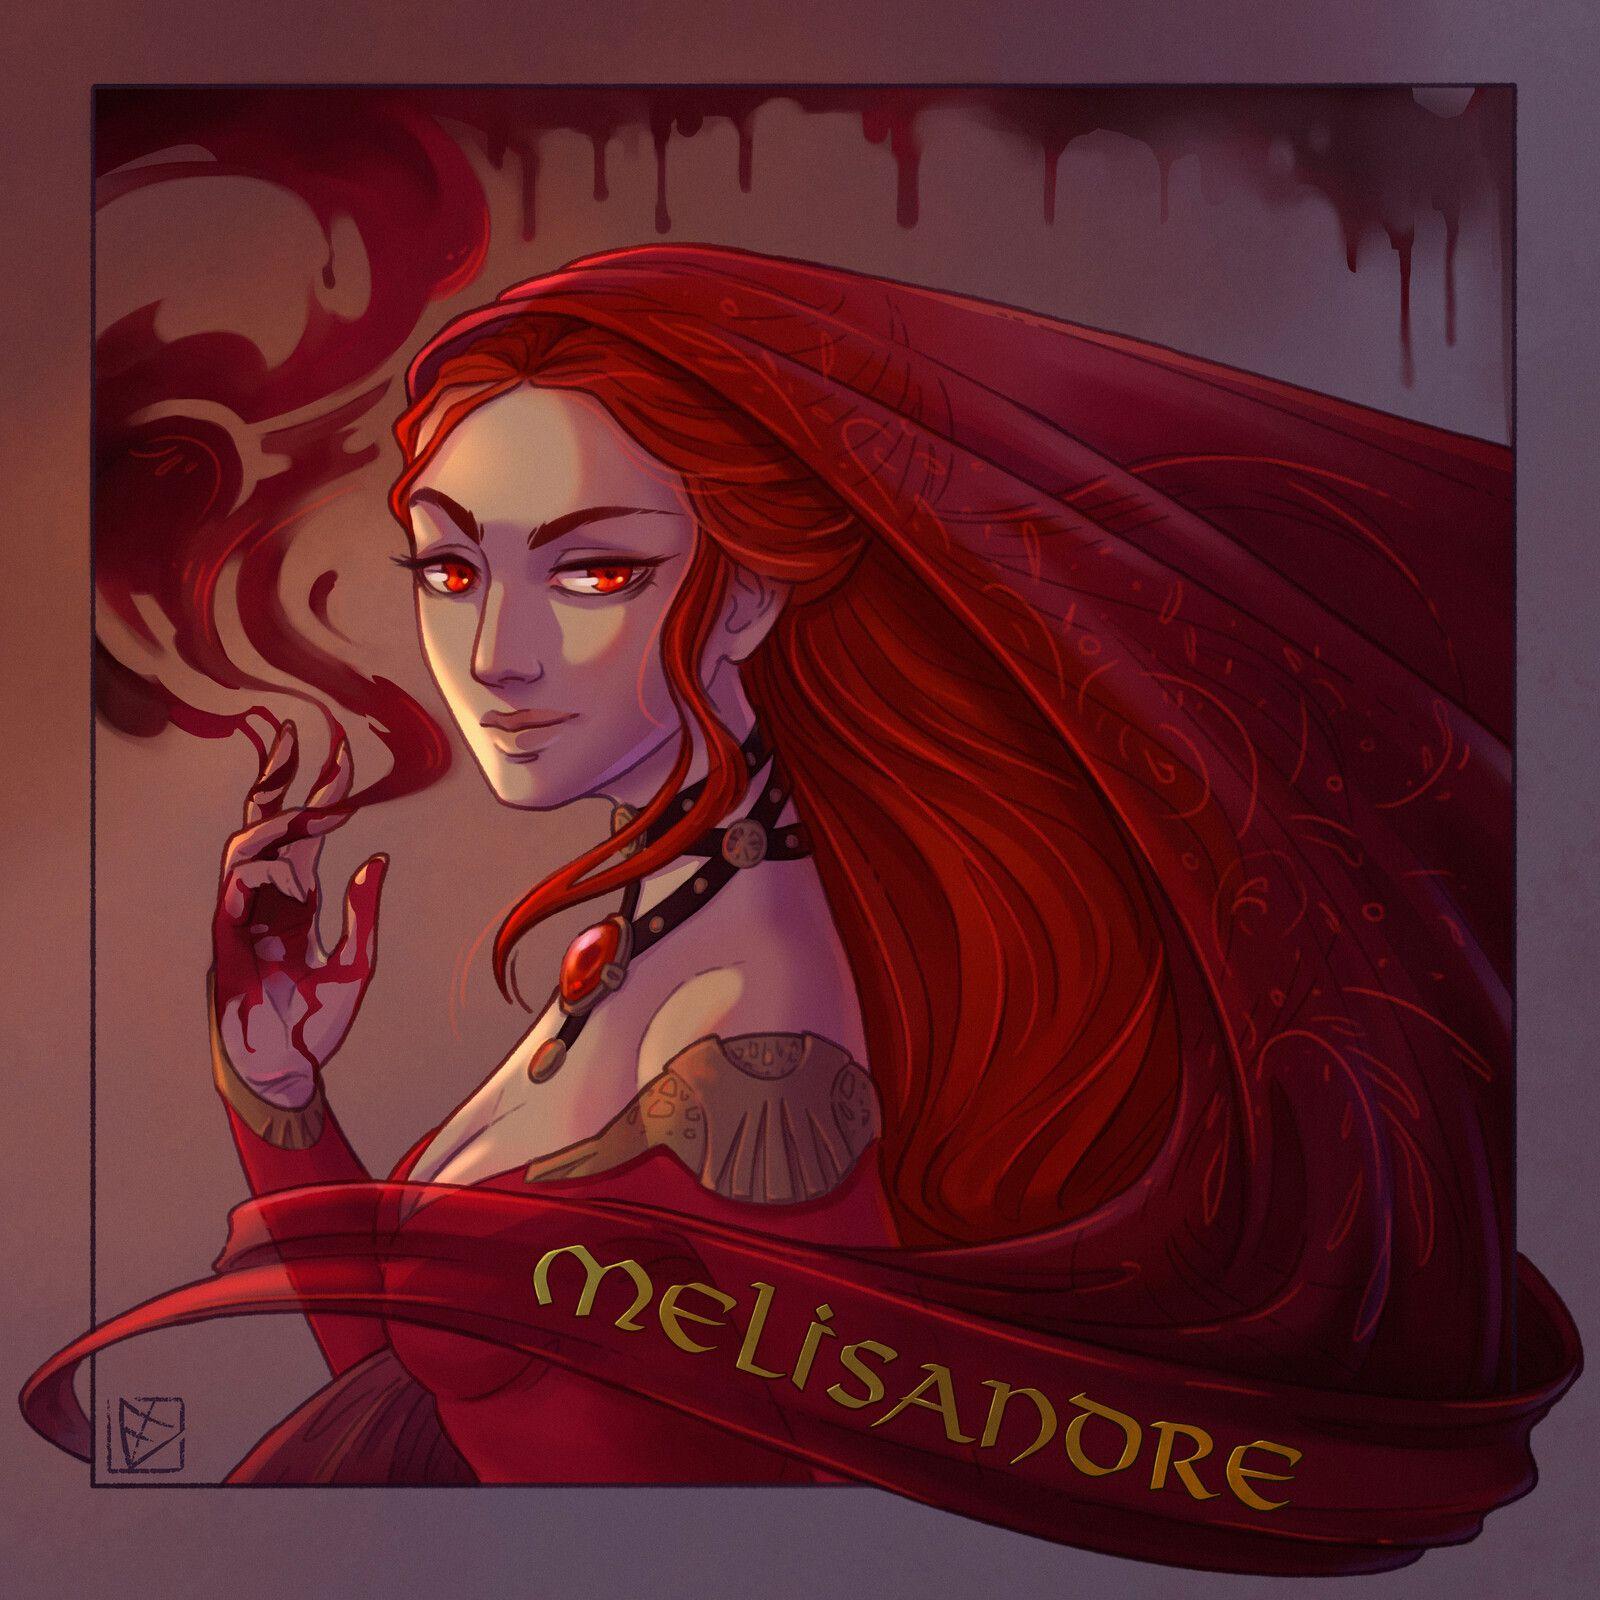 Pin De Madison Reichle Em Game Of Thrones Art Fogo E Gelo E As